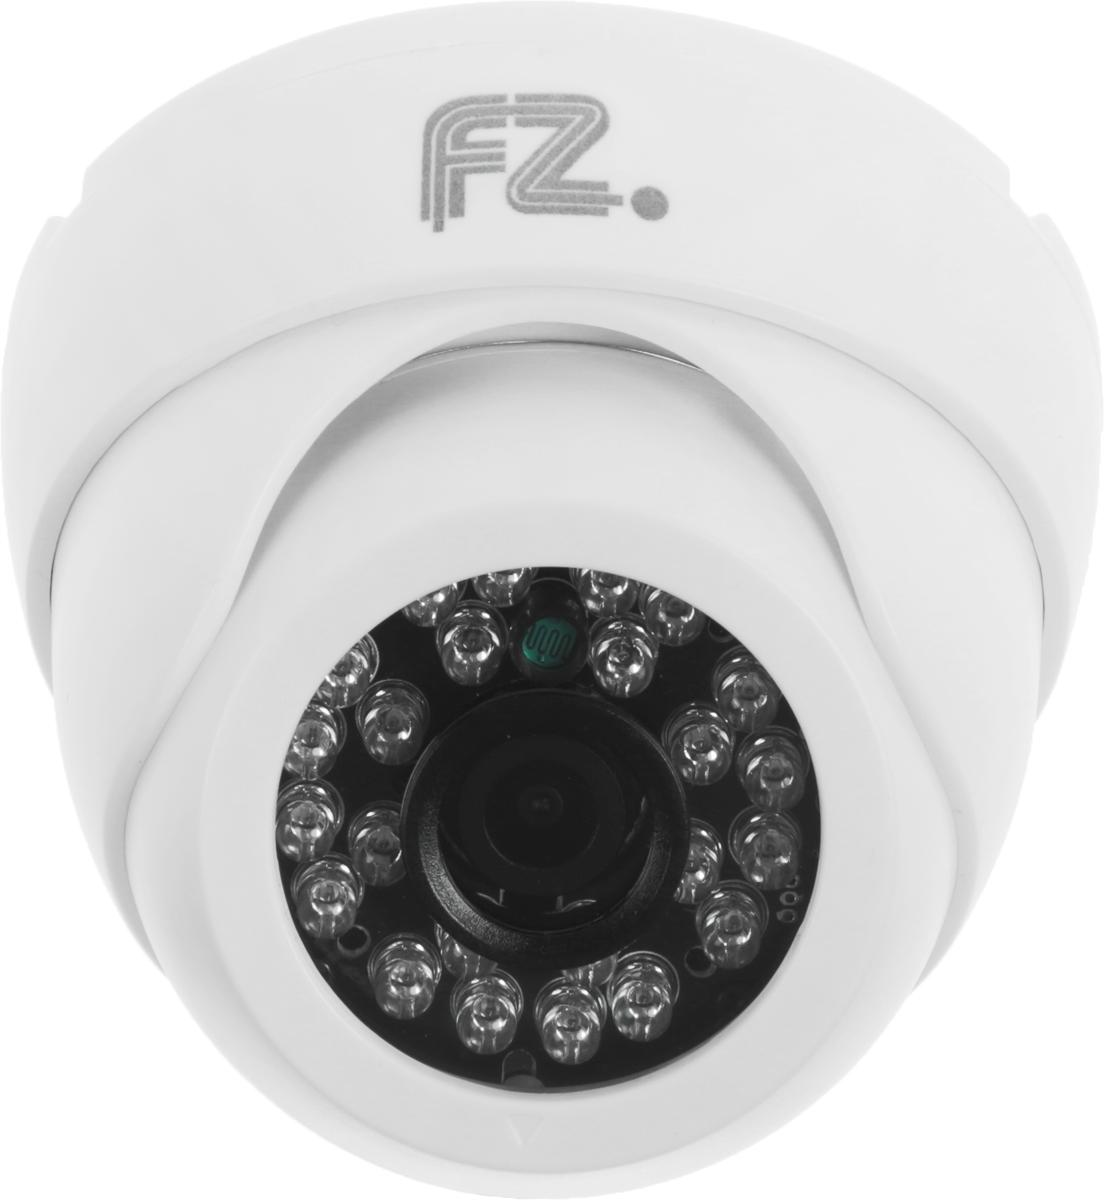 Fazera FZ-DIRP24-720 камера видеонаблюдения fazera fz 04n01 сетевой видеорегистратор